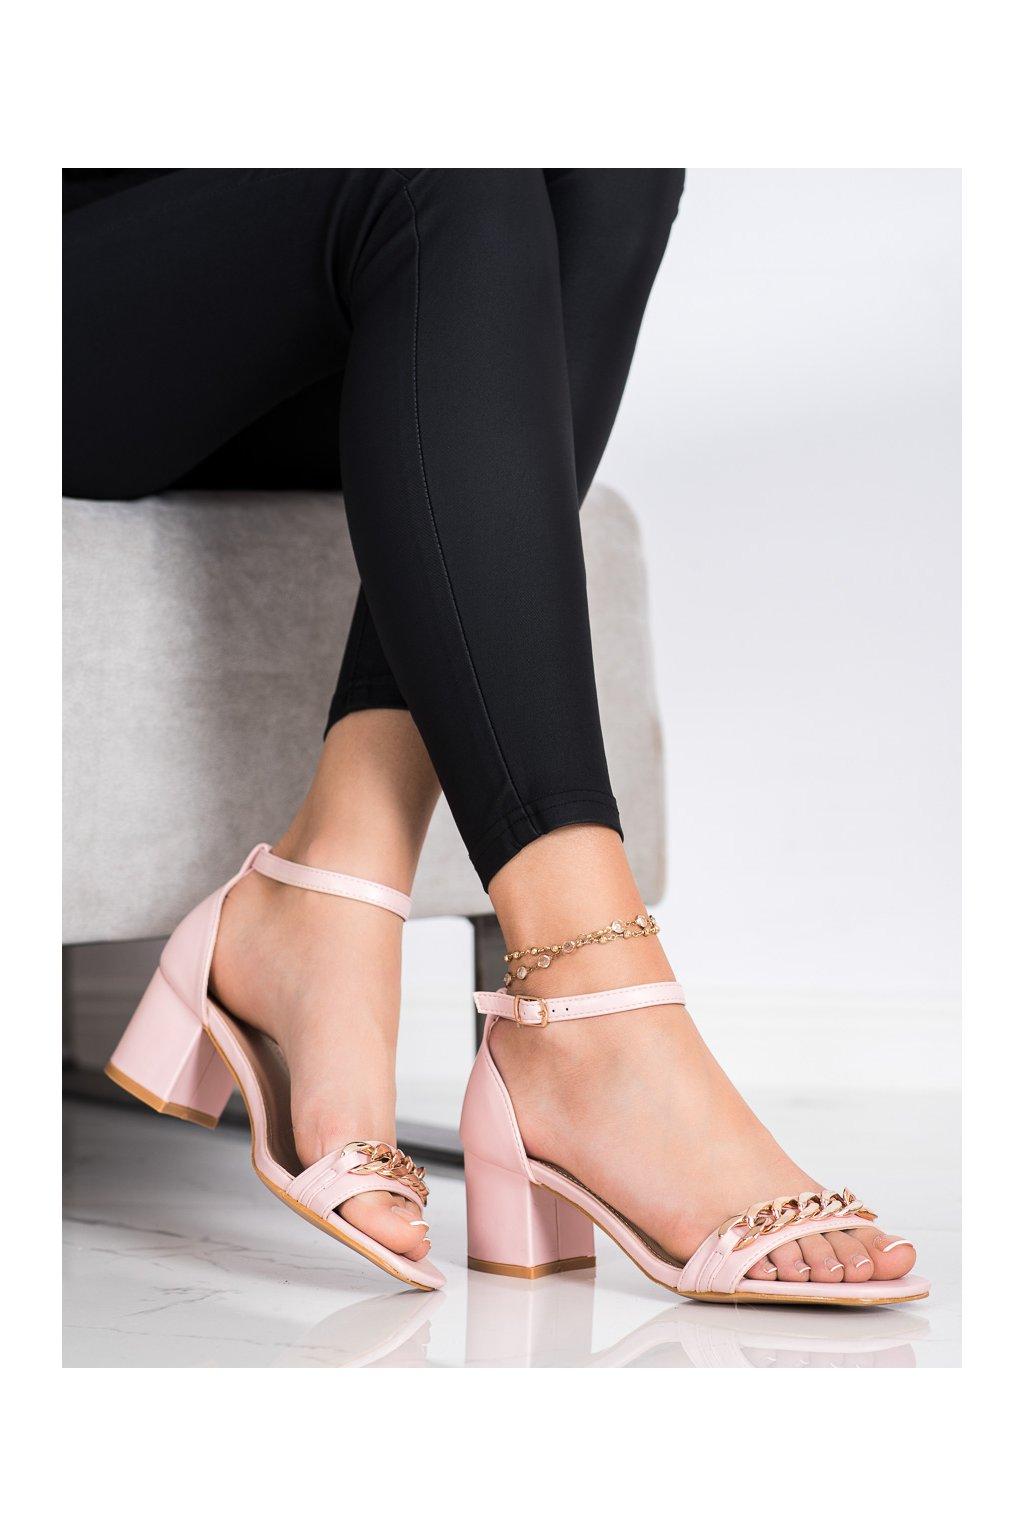 Ružové sandále Shelovet kod 100-159P